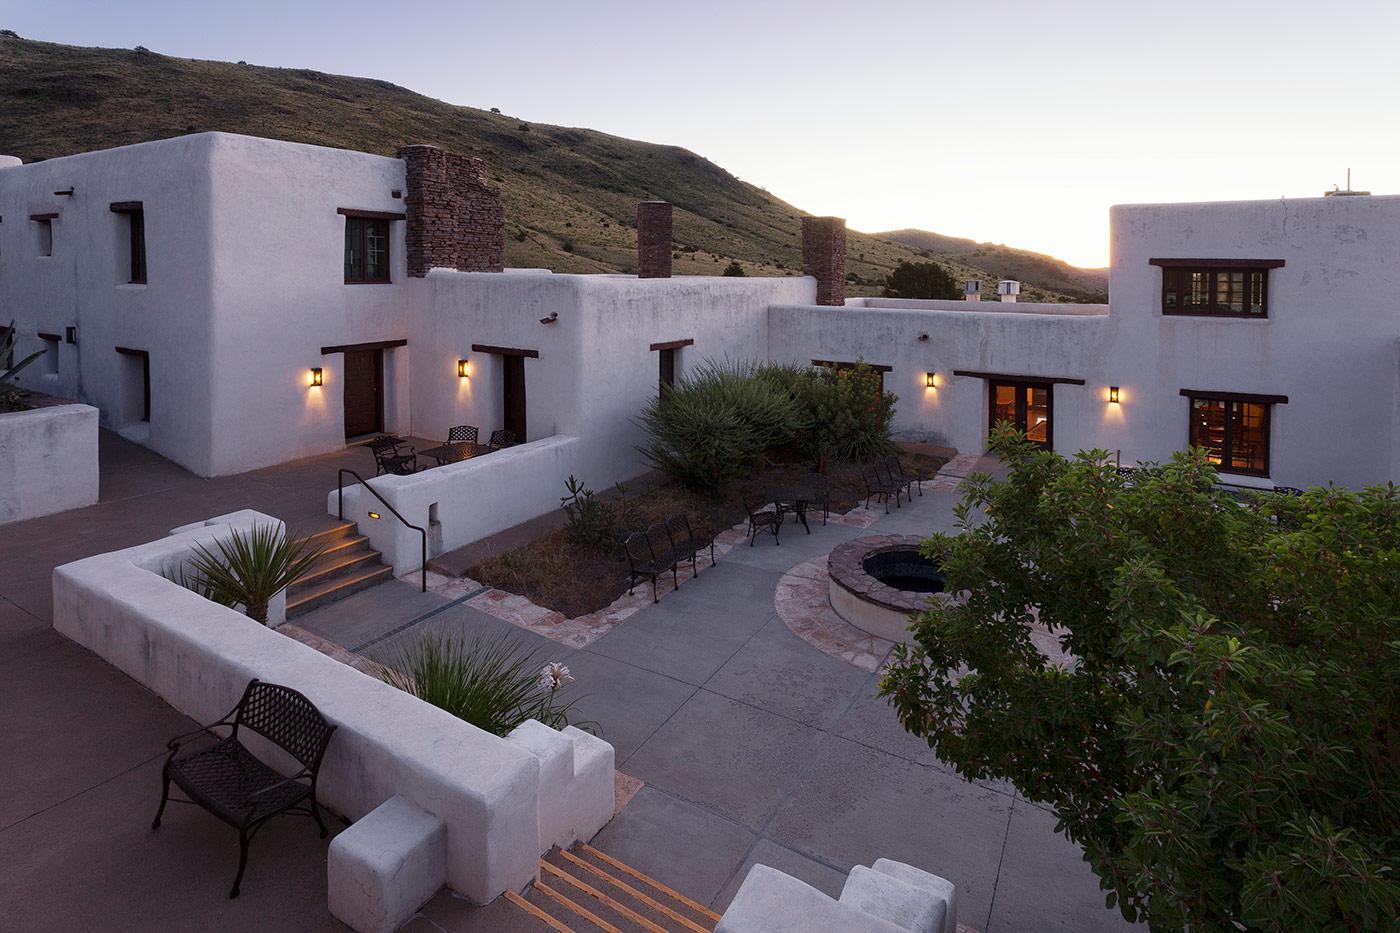 Indian-Lodge_ABP_Courtyard2.jpg